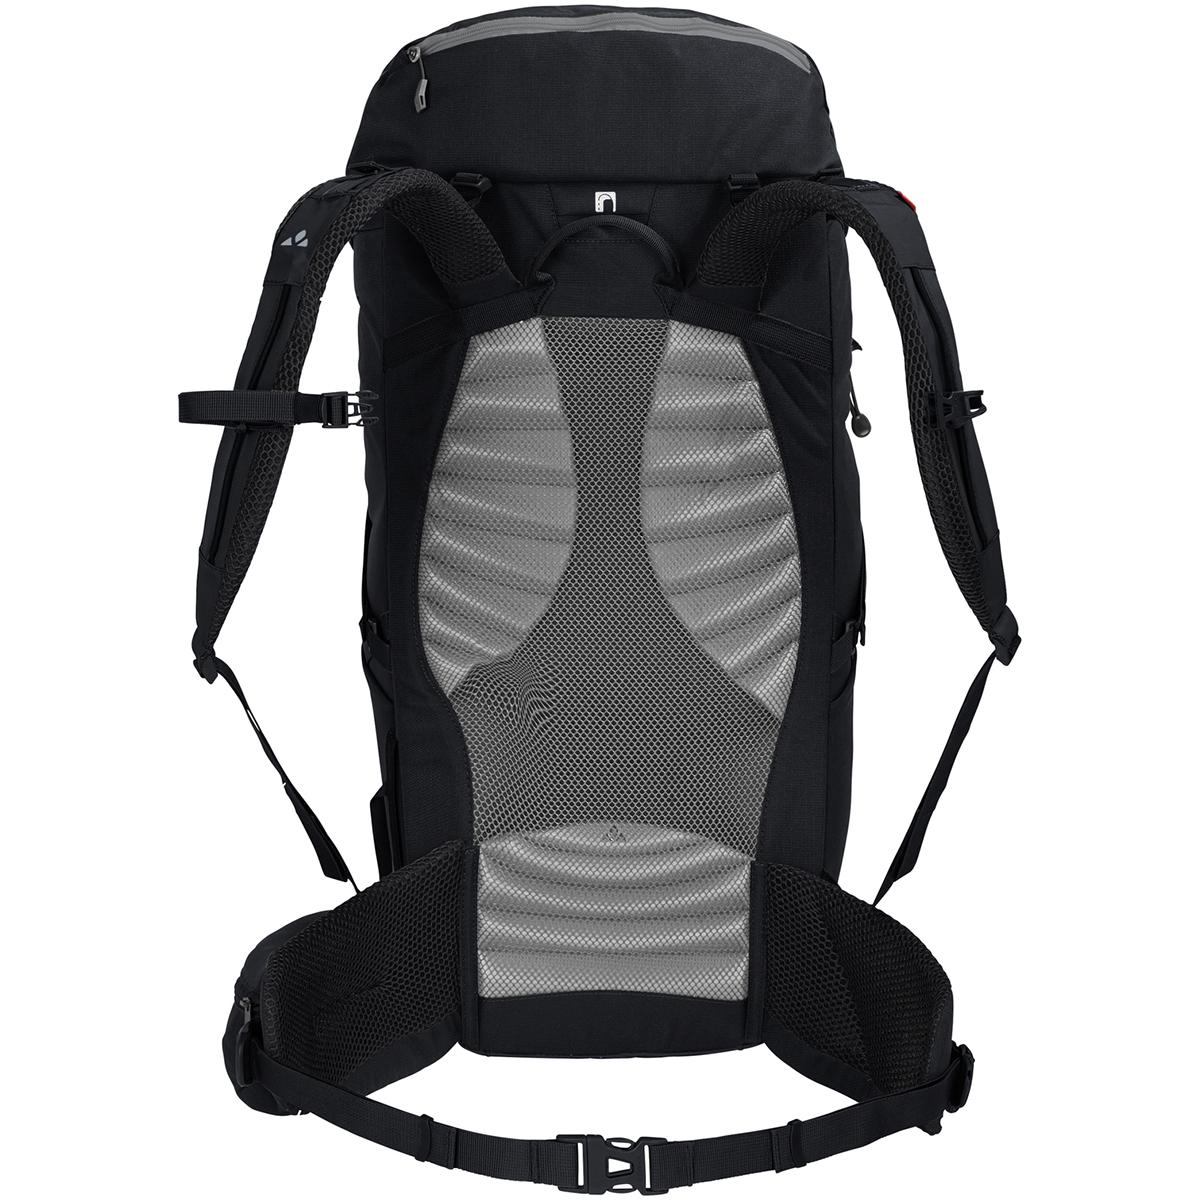 Vaude-Prokyon-30-L-Hiking-Backpack thumbnail 3